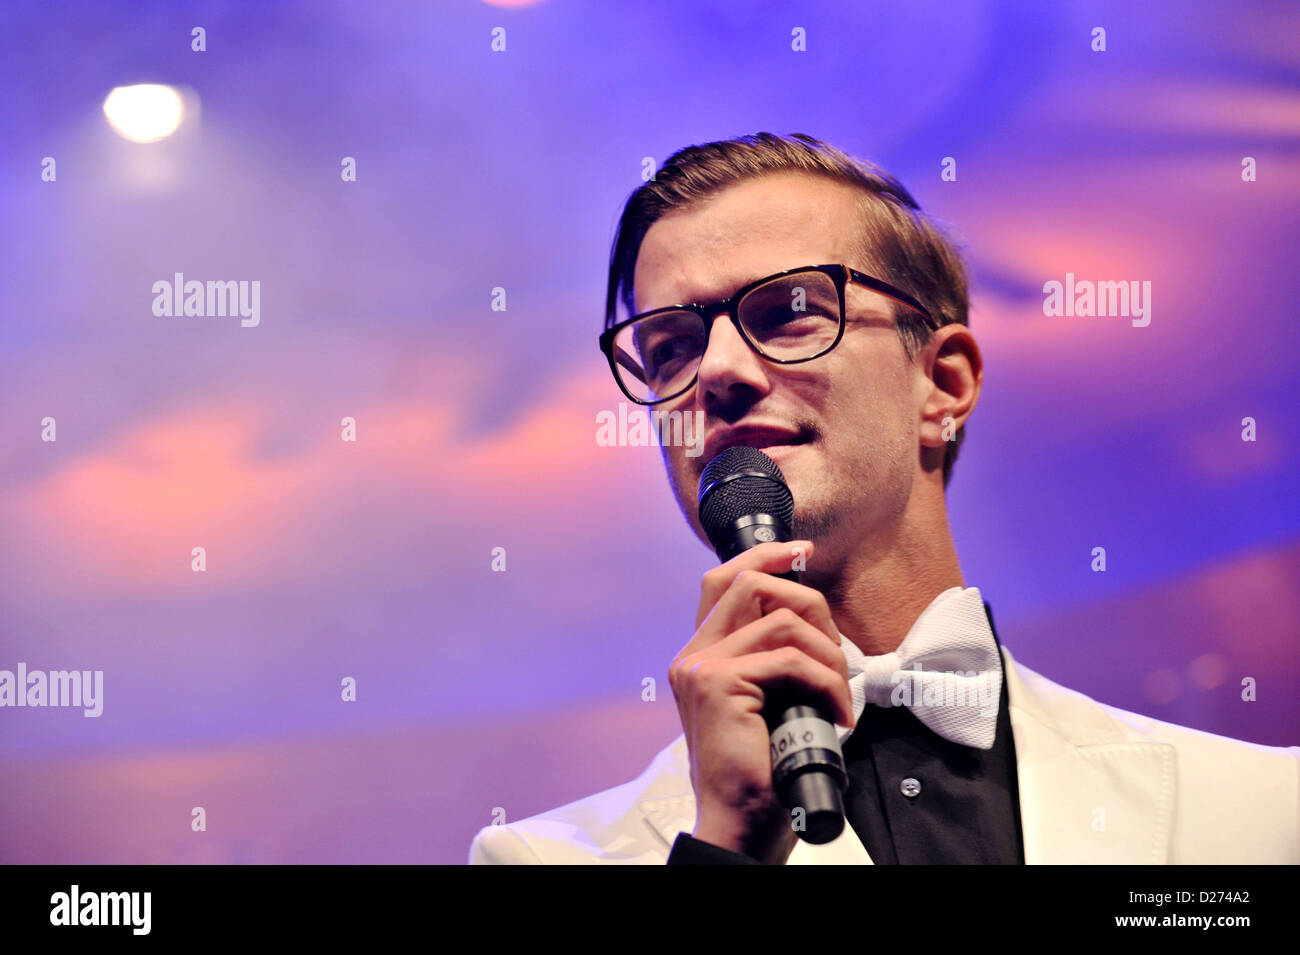 Host Joko Winterscheidt talks at the beginning of the fashion fair 'Bread & Butter' in Berlin at the - Stock Image